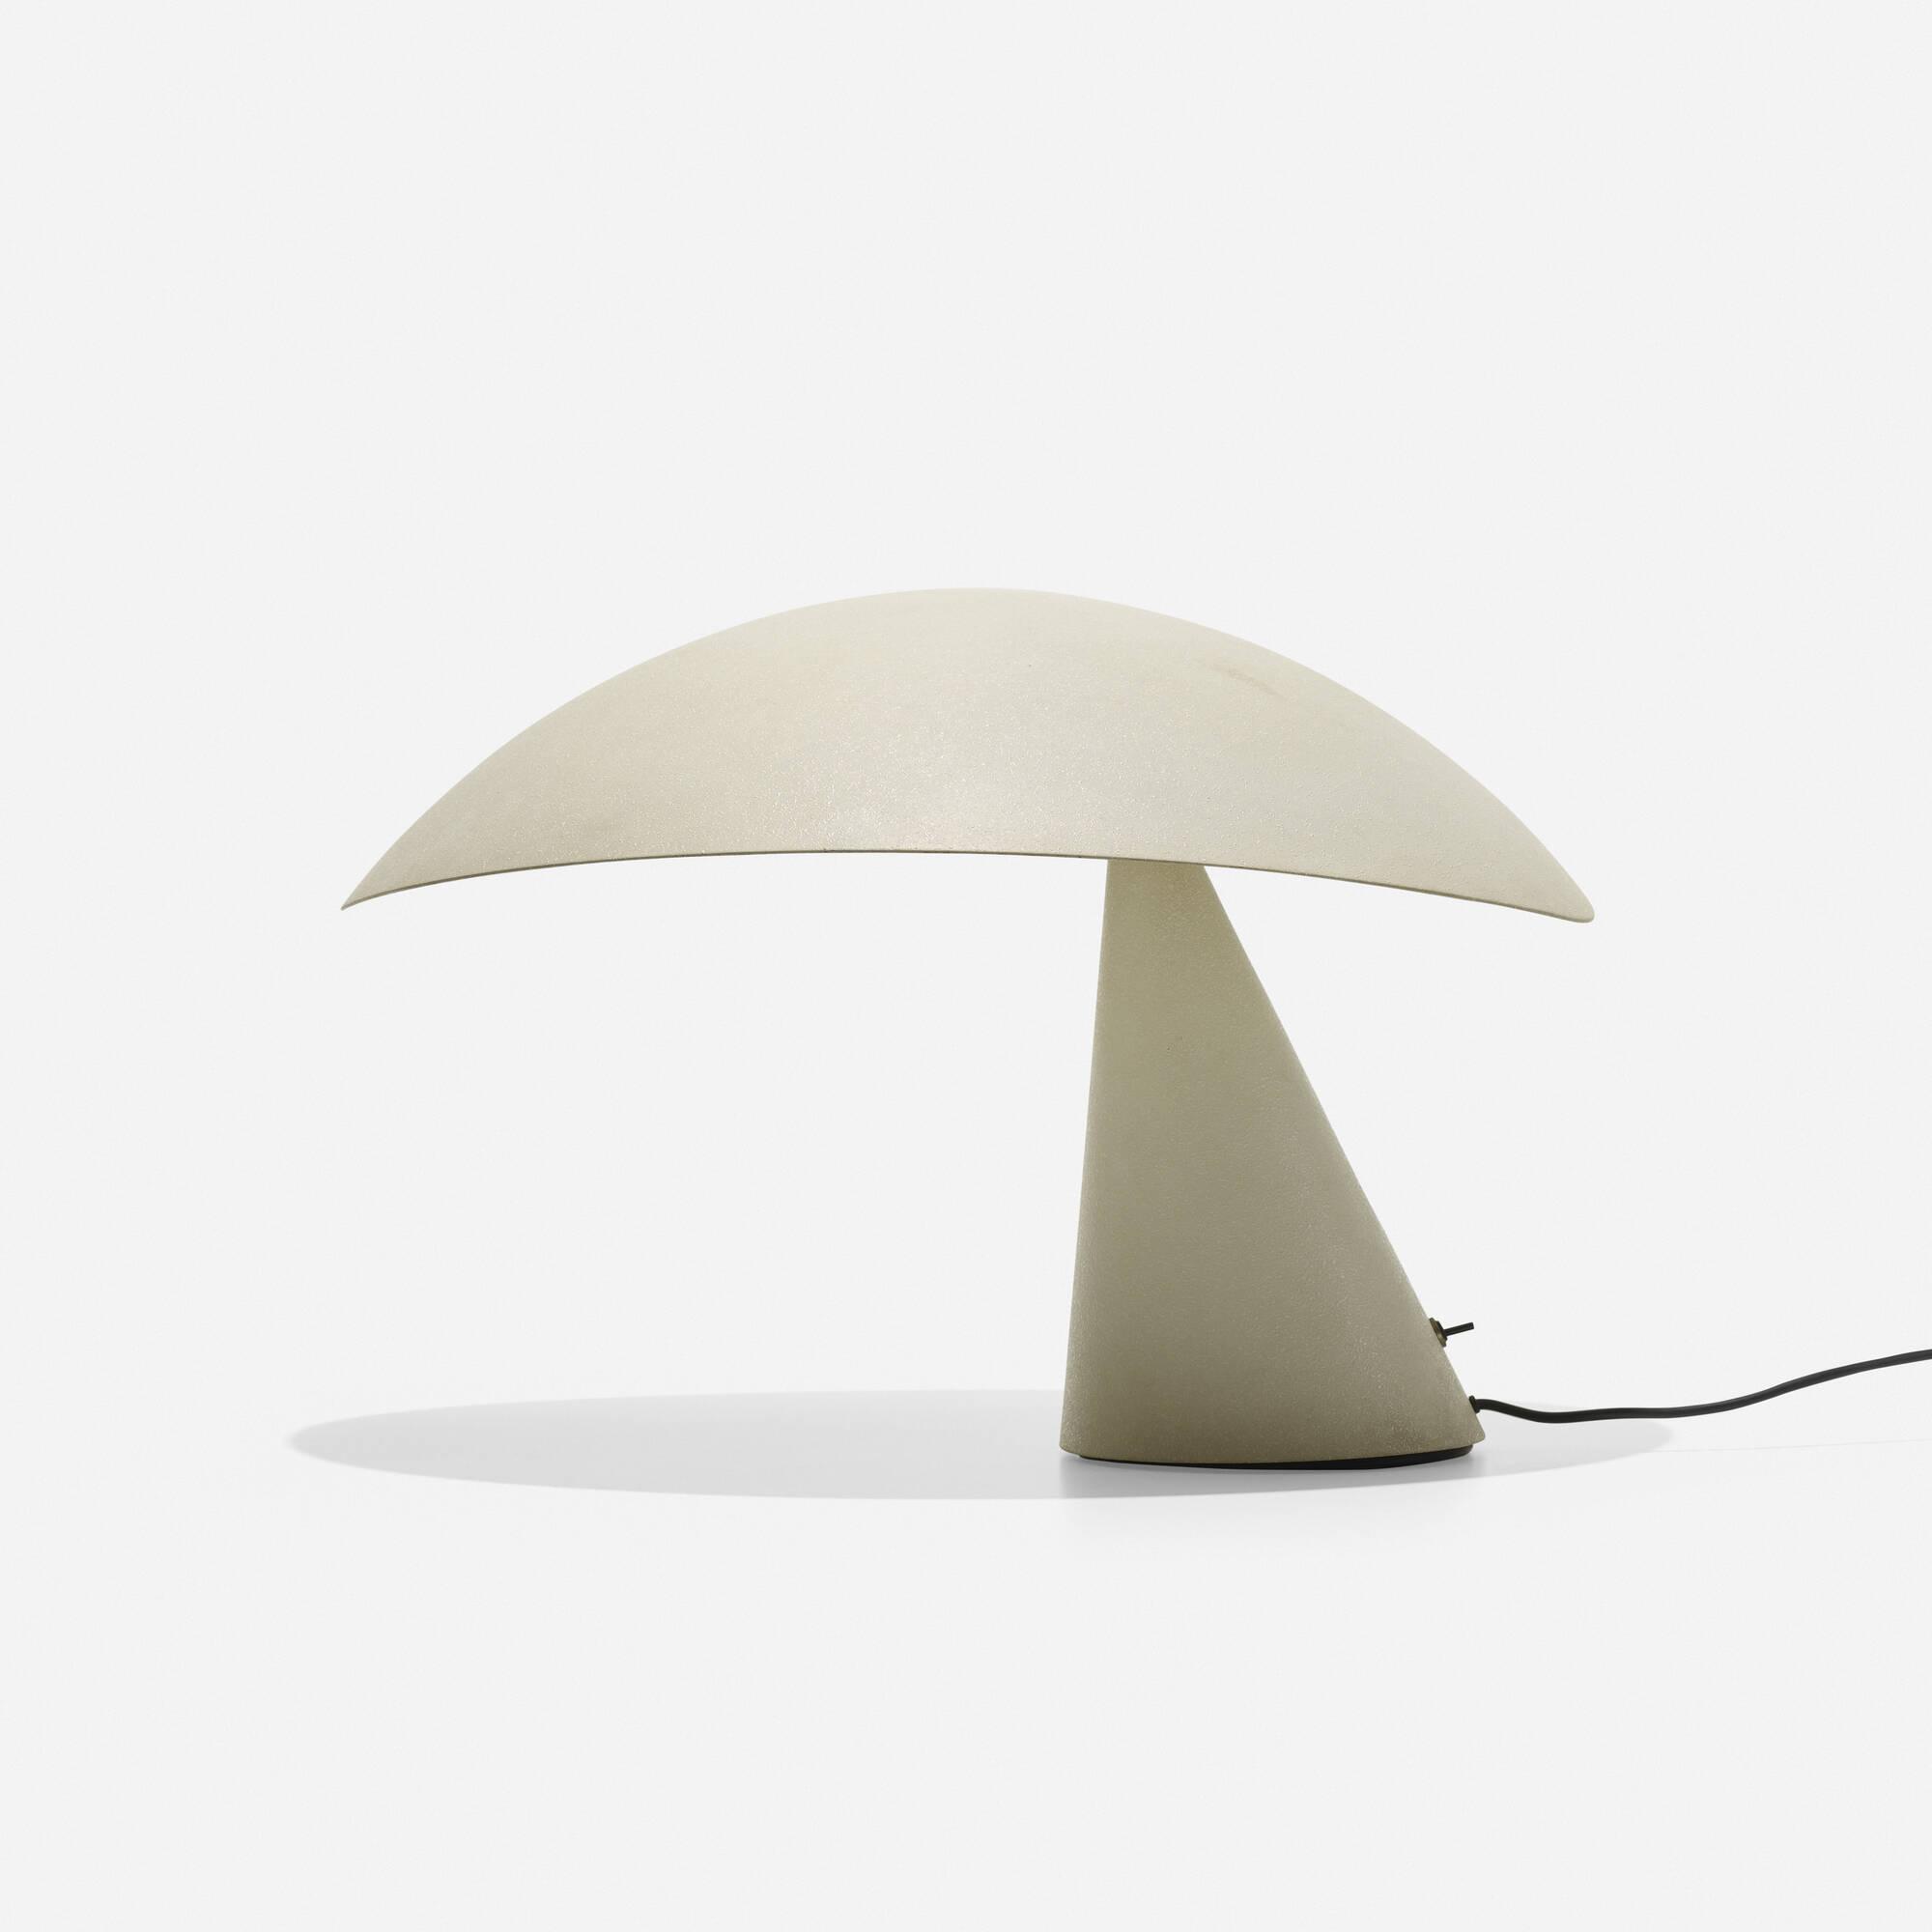 123: Masayuki Kurokawa / Lavinia table lamp (1 of 2)